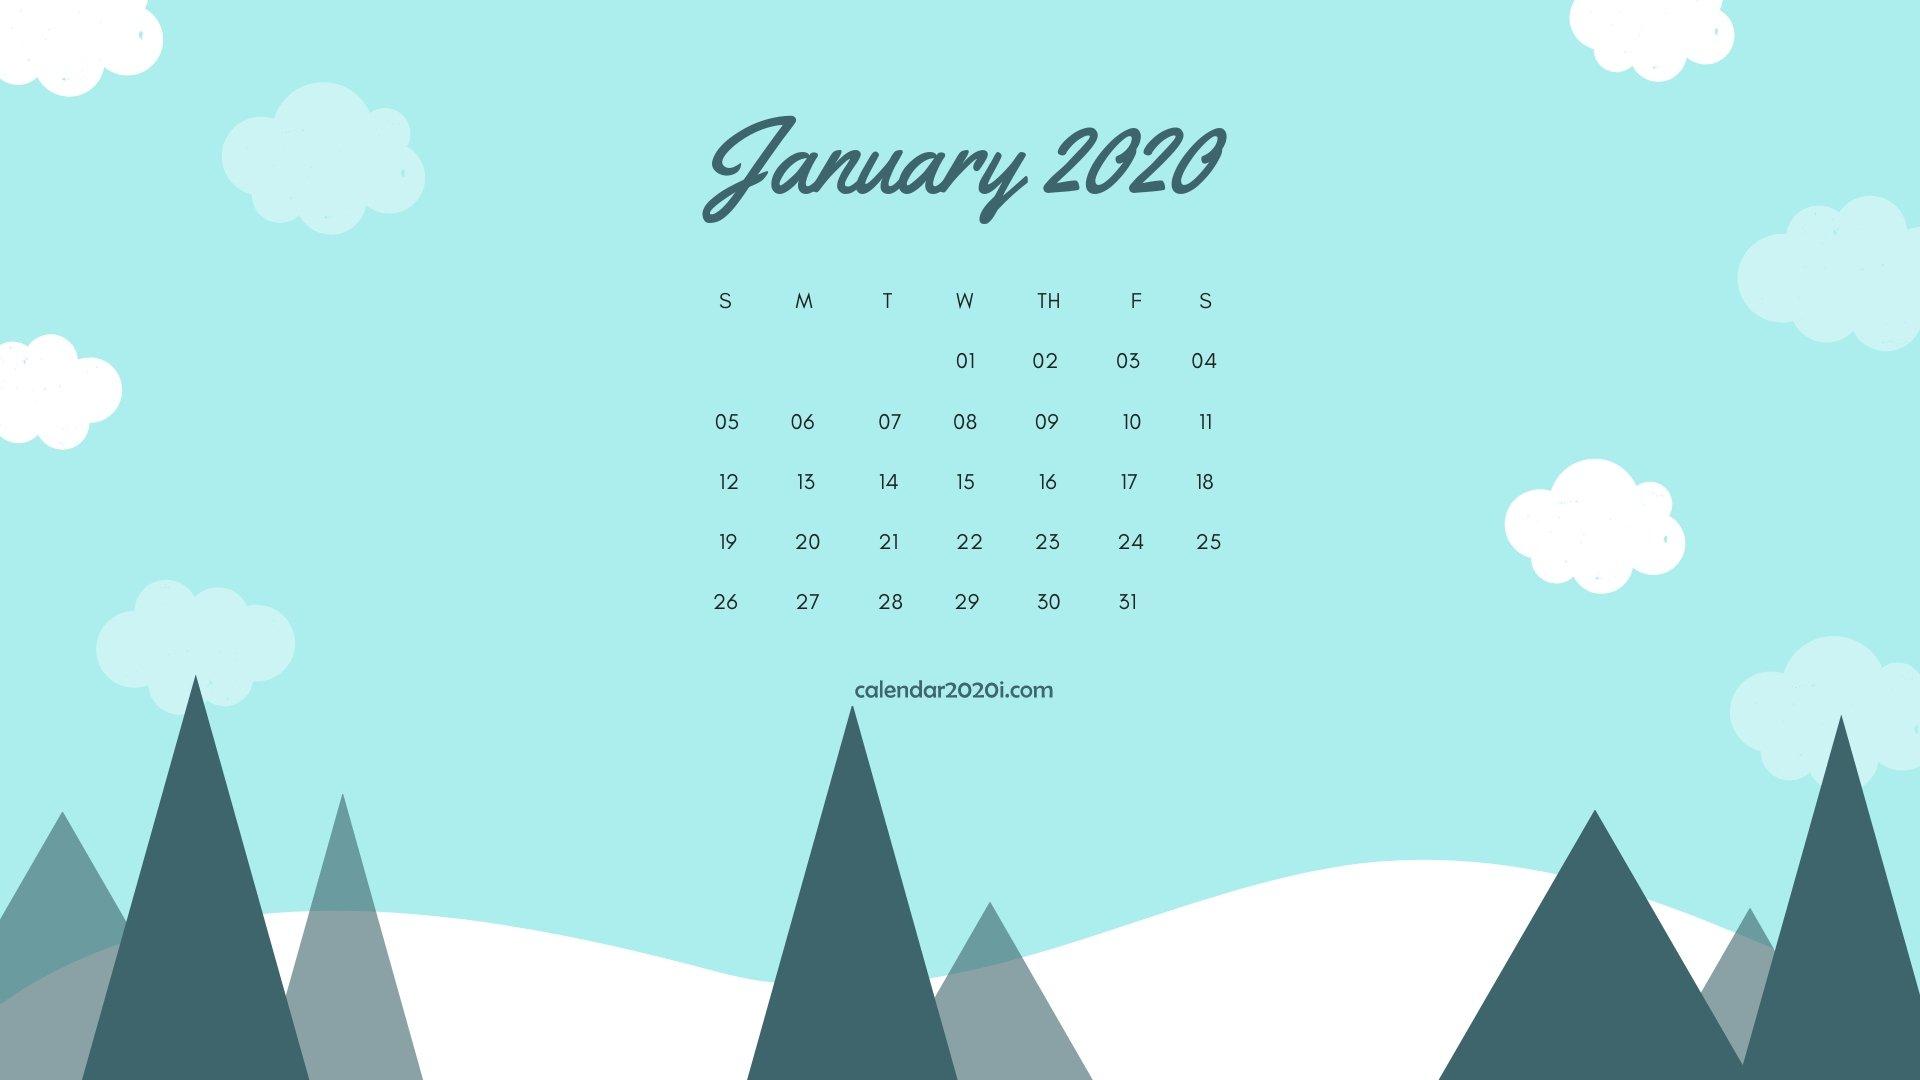 2020 Calendar Hd Wallpaper   Happy New Year Gifs 2019   1920x1080 1920x1080